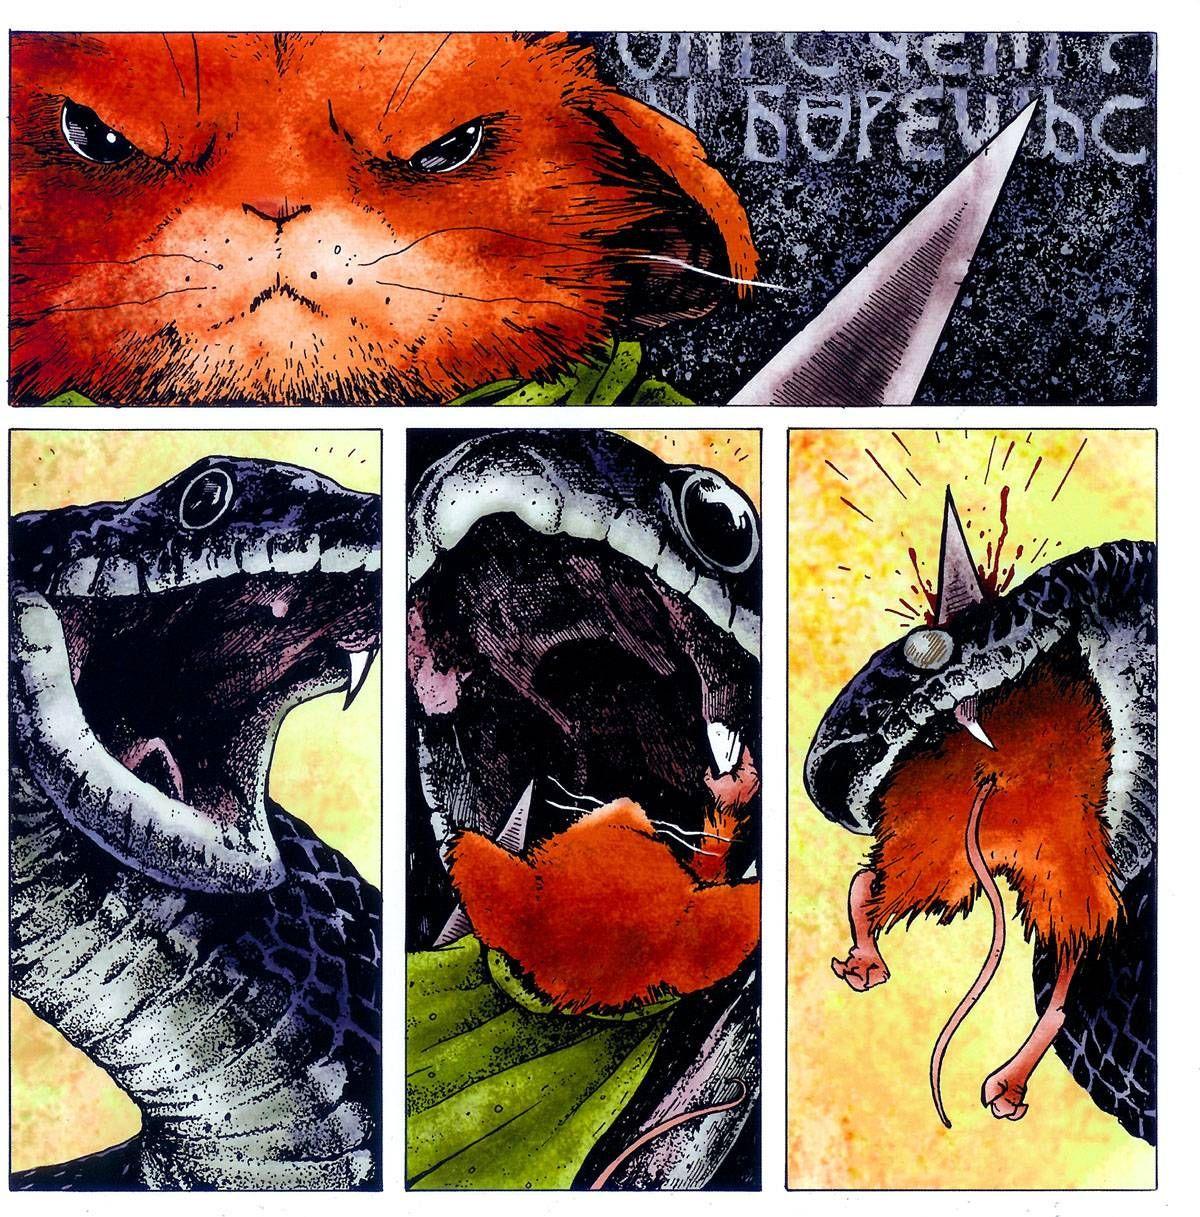 Мышиная Гвардия: Осень 1152 №1 онлайн   Комиксы, Осень и ...